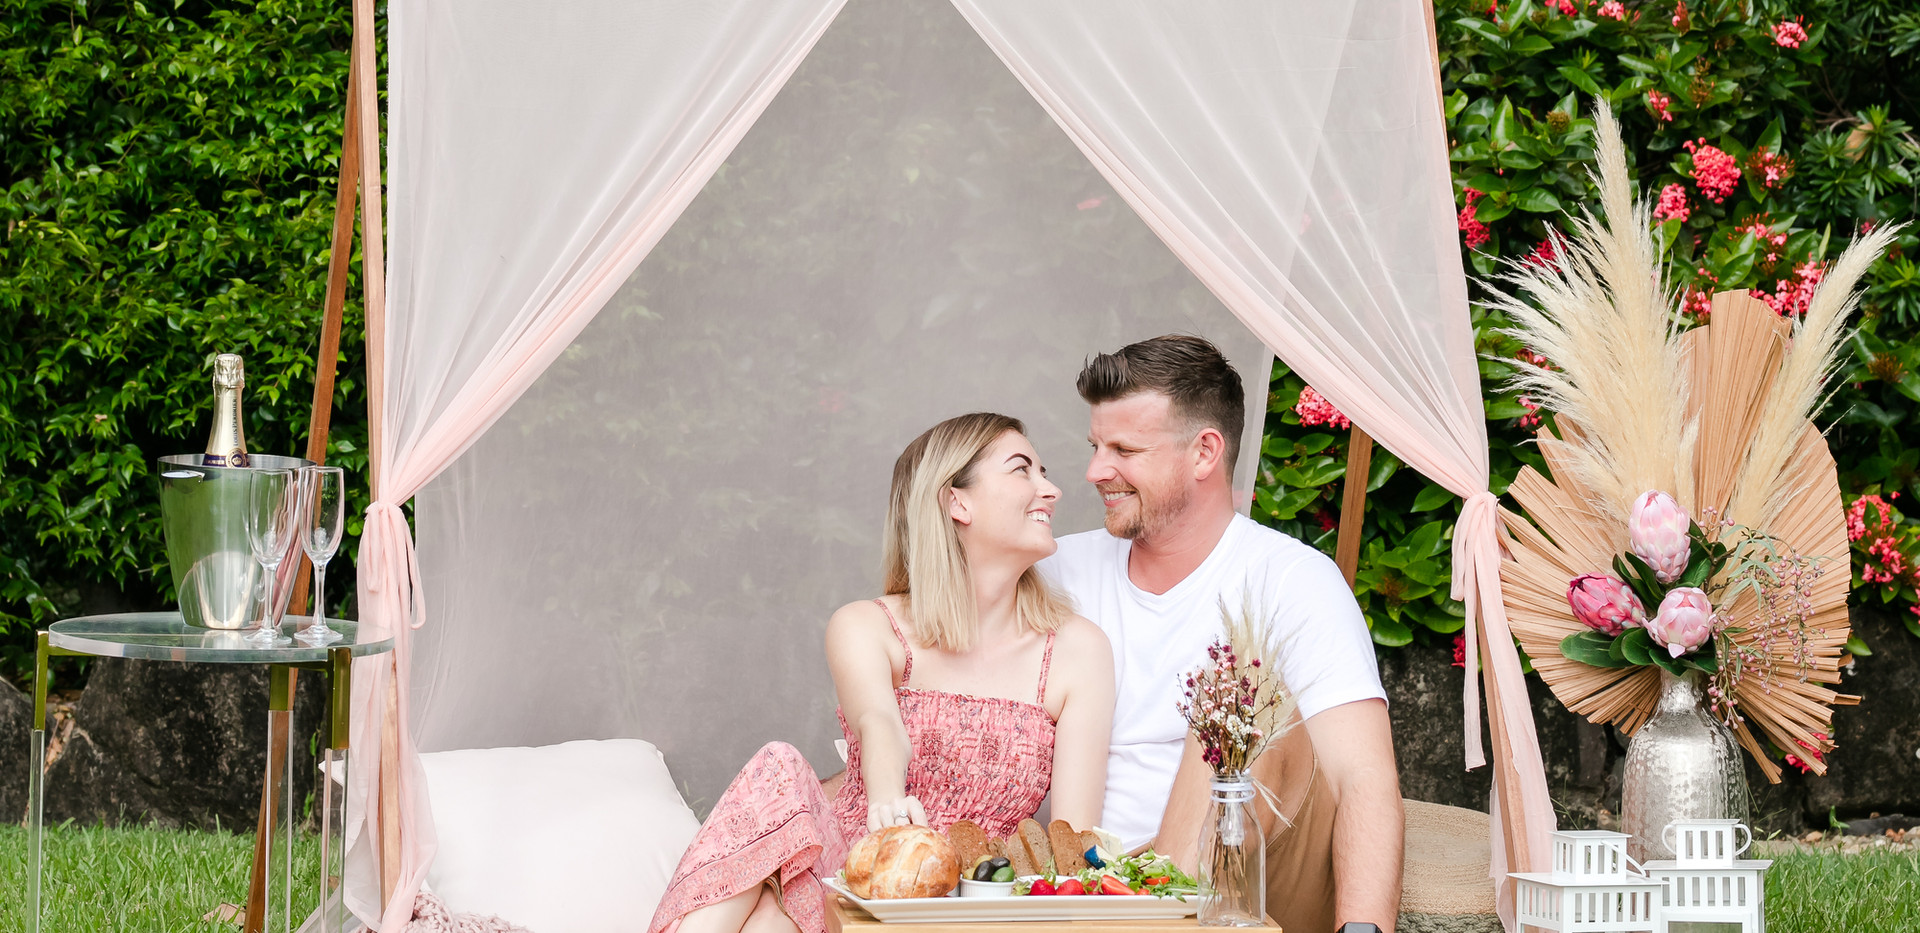 Romantic picnic_.jpg